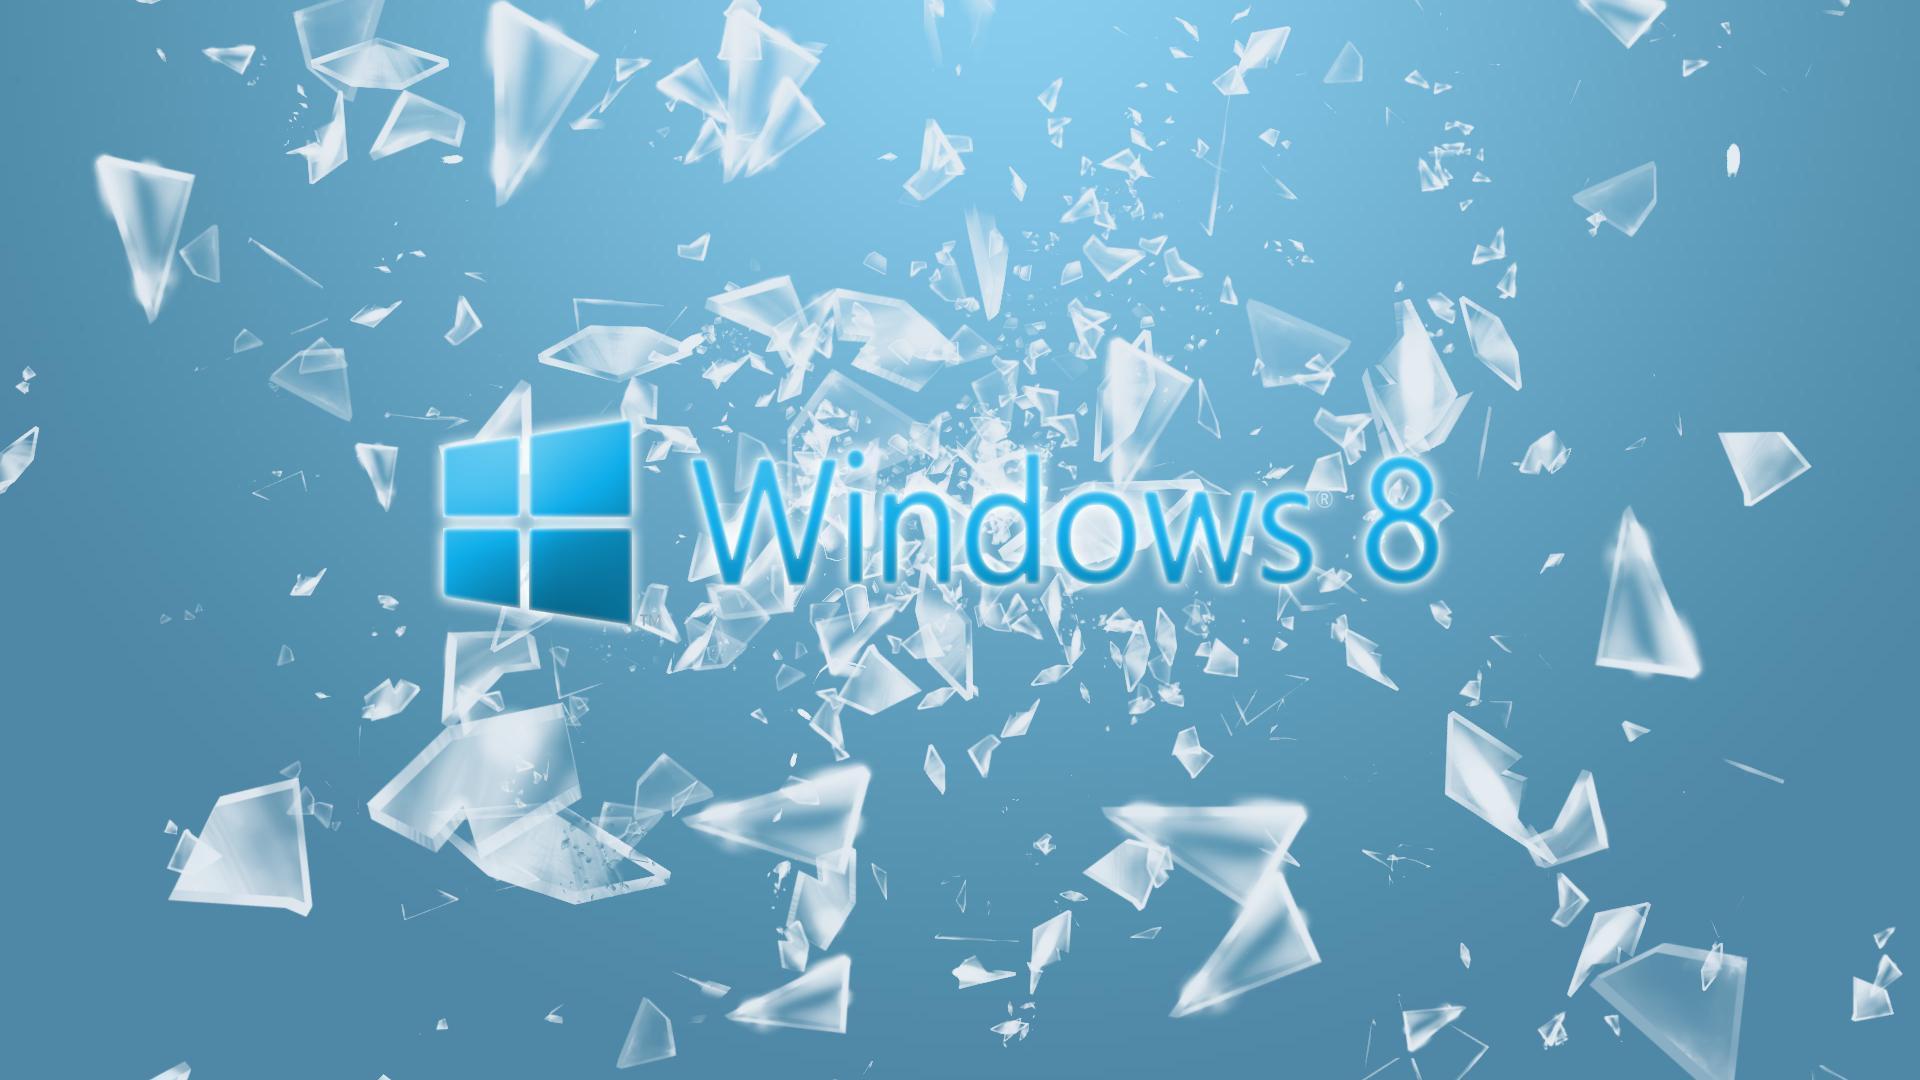 Windows 8 Wallpapers Release: Windows 8 3D Wallpapers